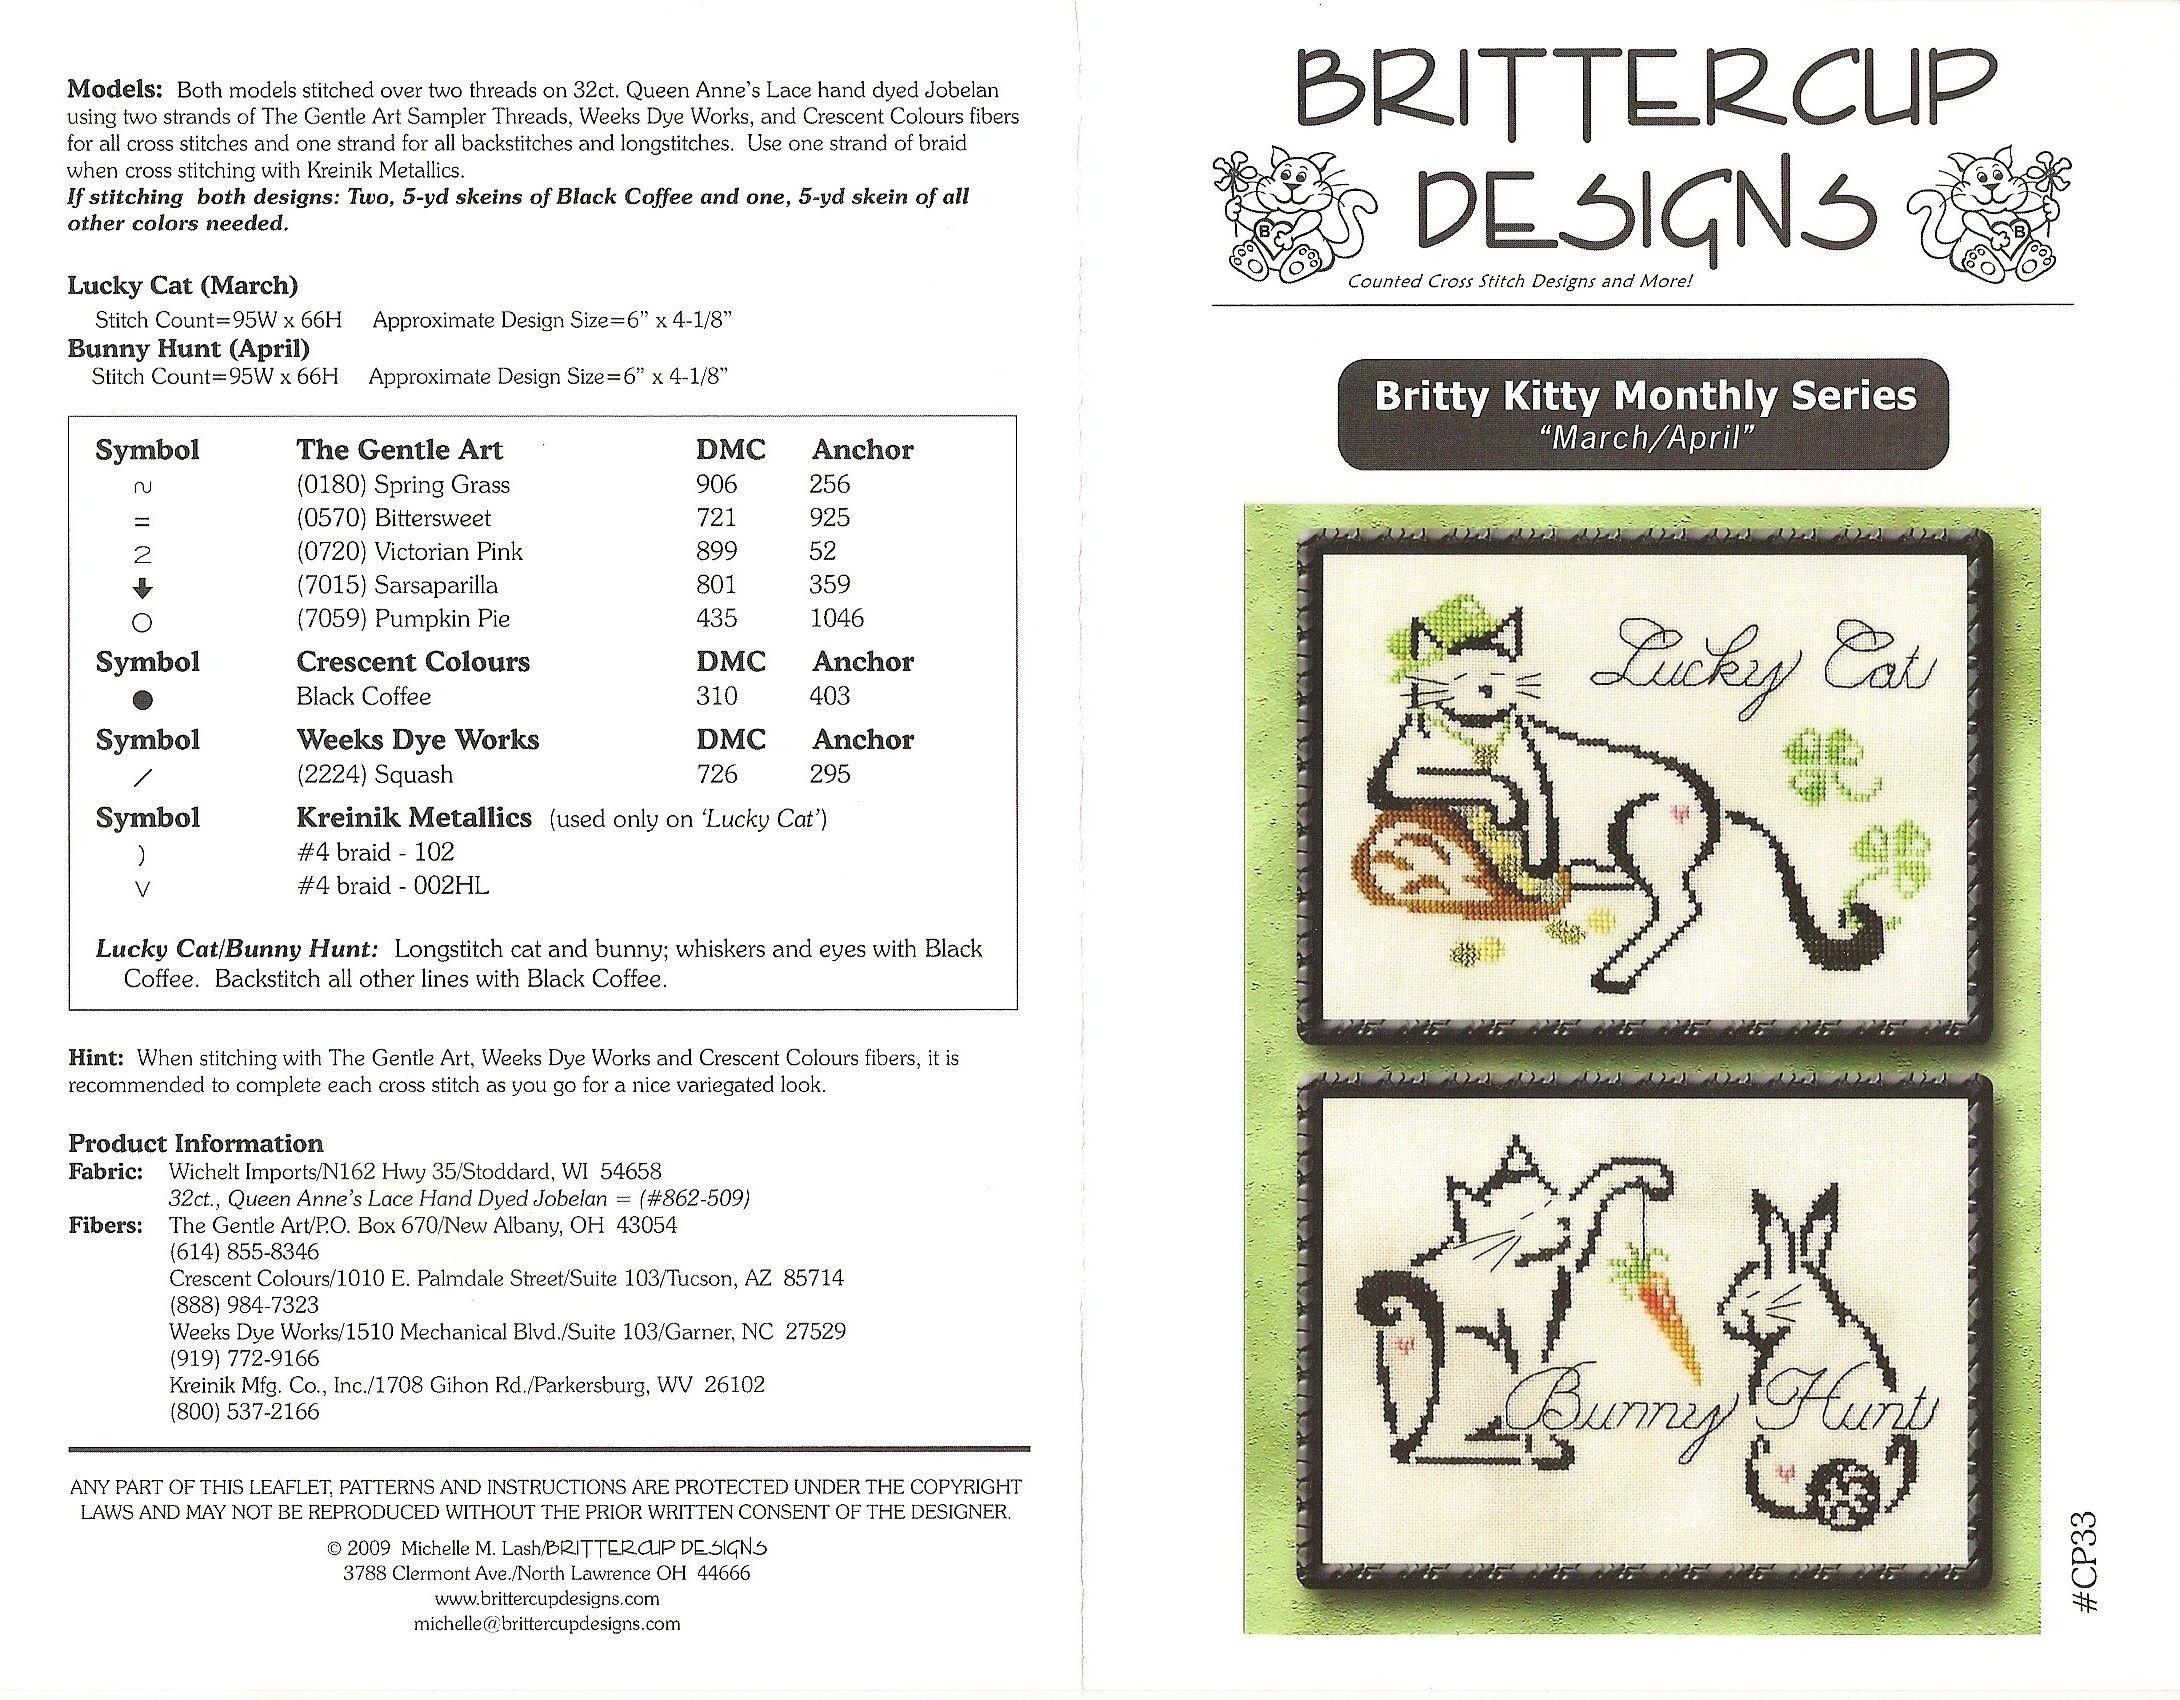 Brittercup-Designs-Britty-Kitties-MarApr.jpg (2180×1700)